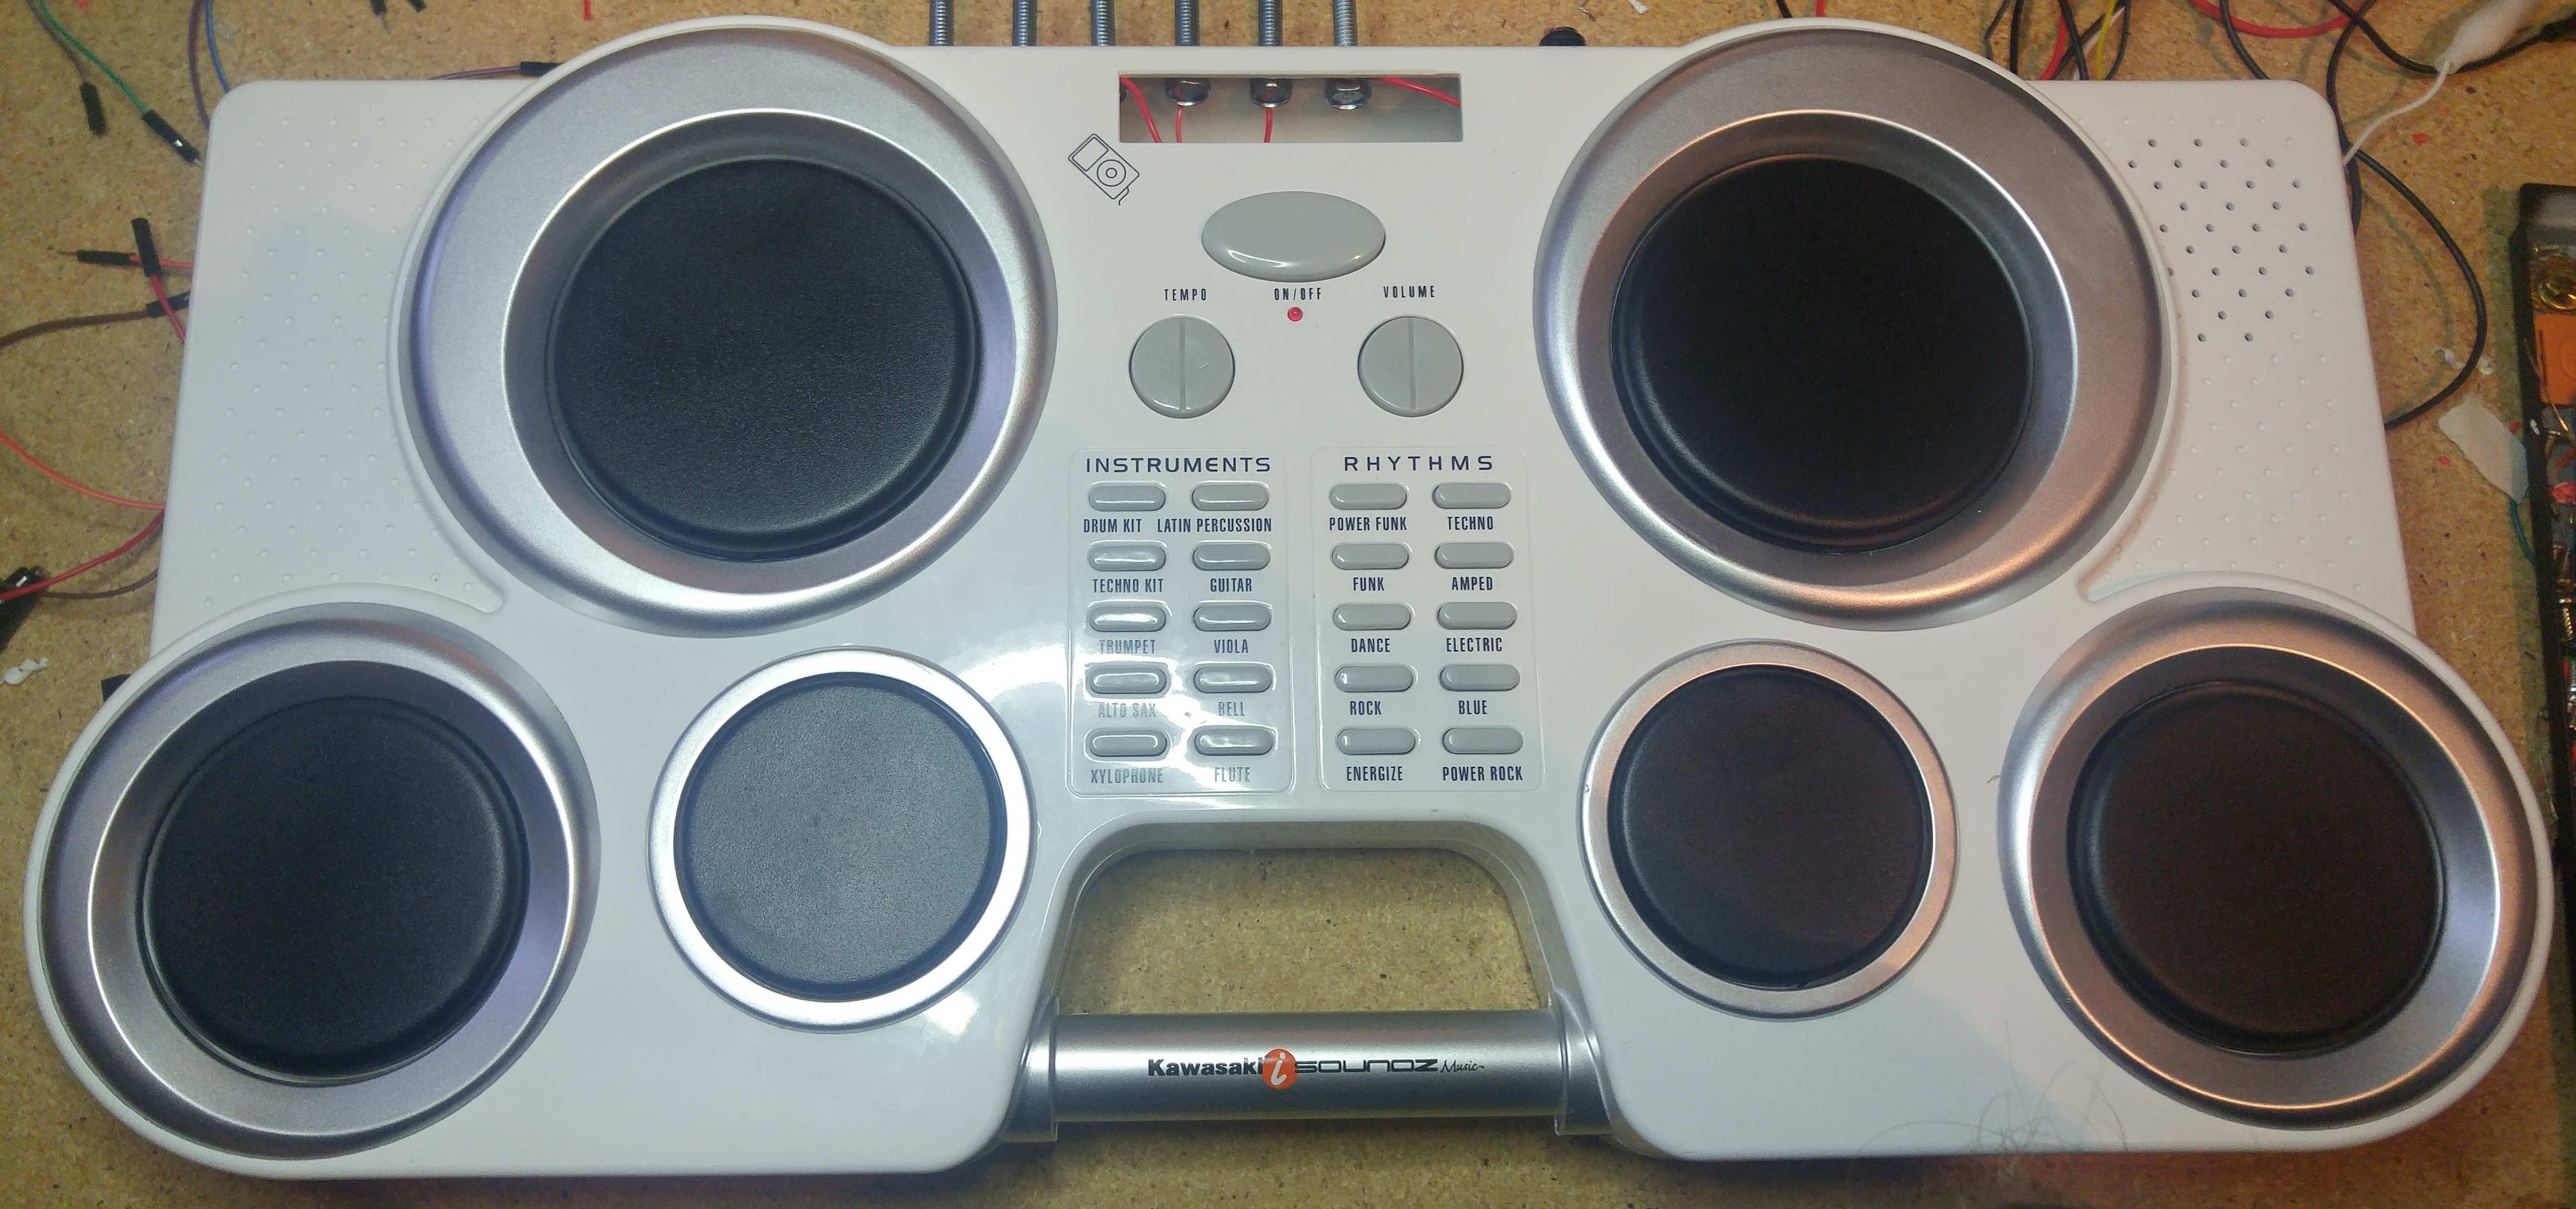 Adding External Triggers - Kawasaki I-Soundz Drums - Sam Vs  Sound